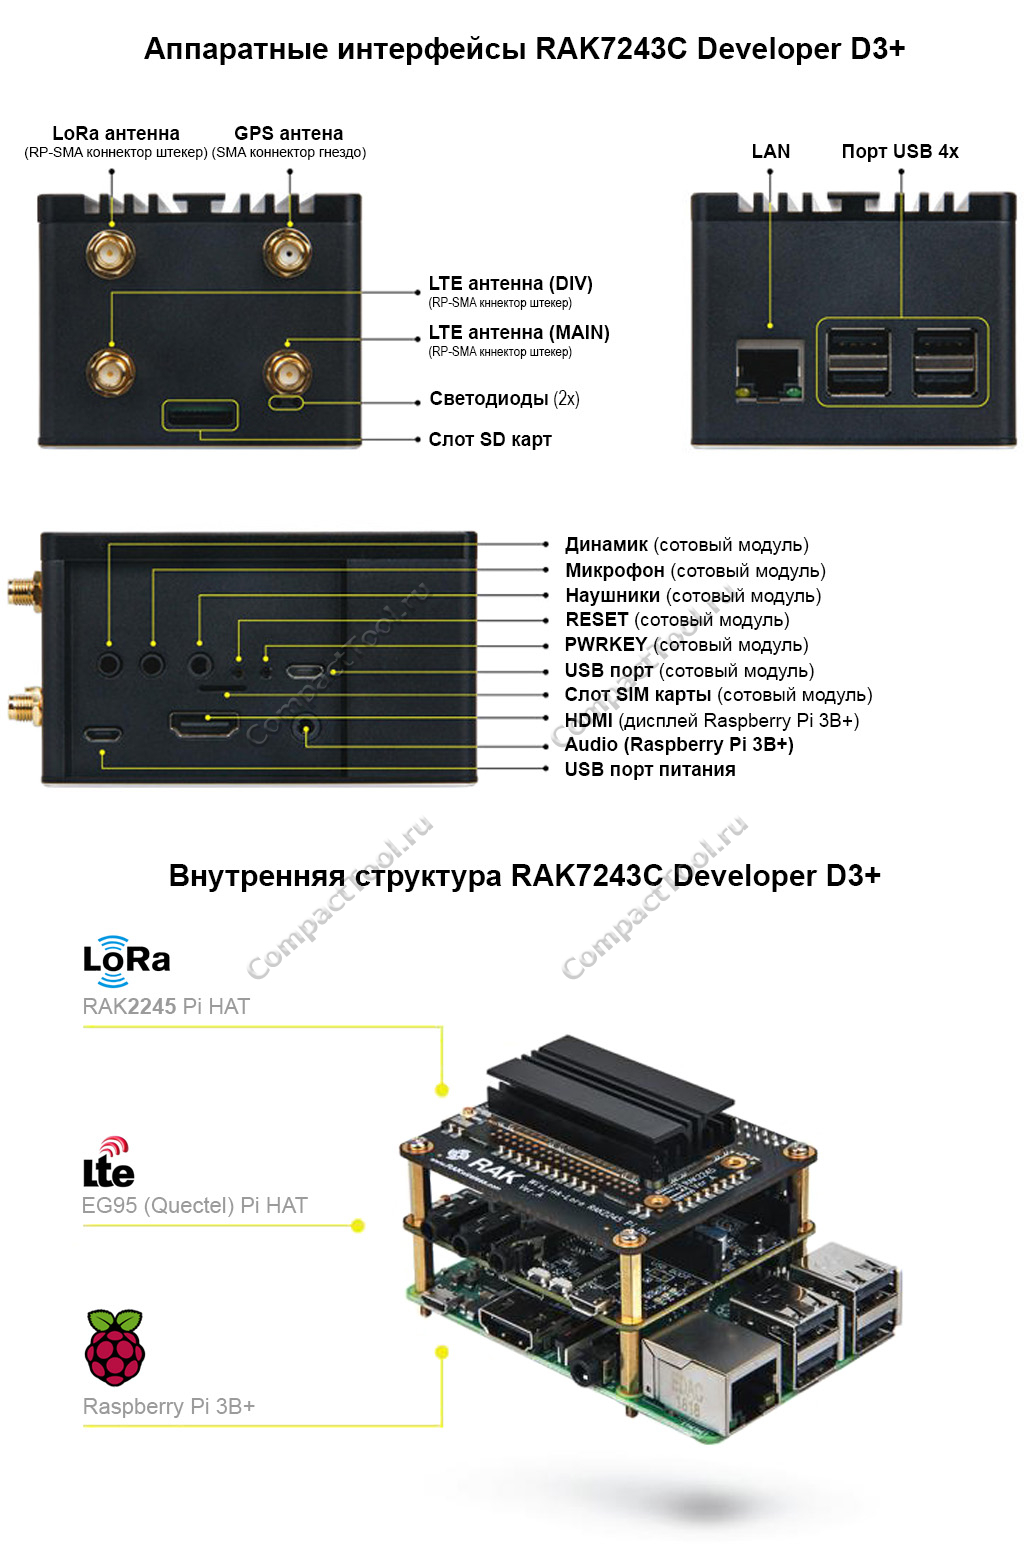 Обзор шлюза-концетратора LoRa RAK7243 Developer D3 (Pilot Gateway Pro)